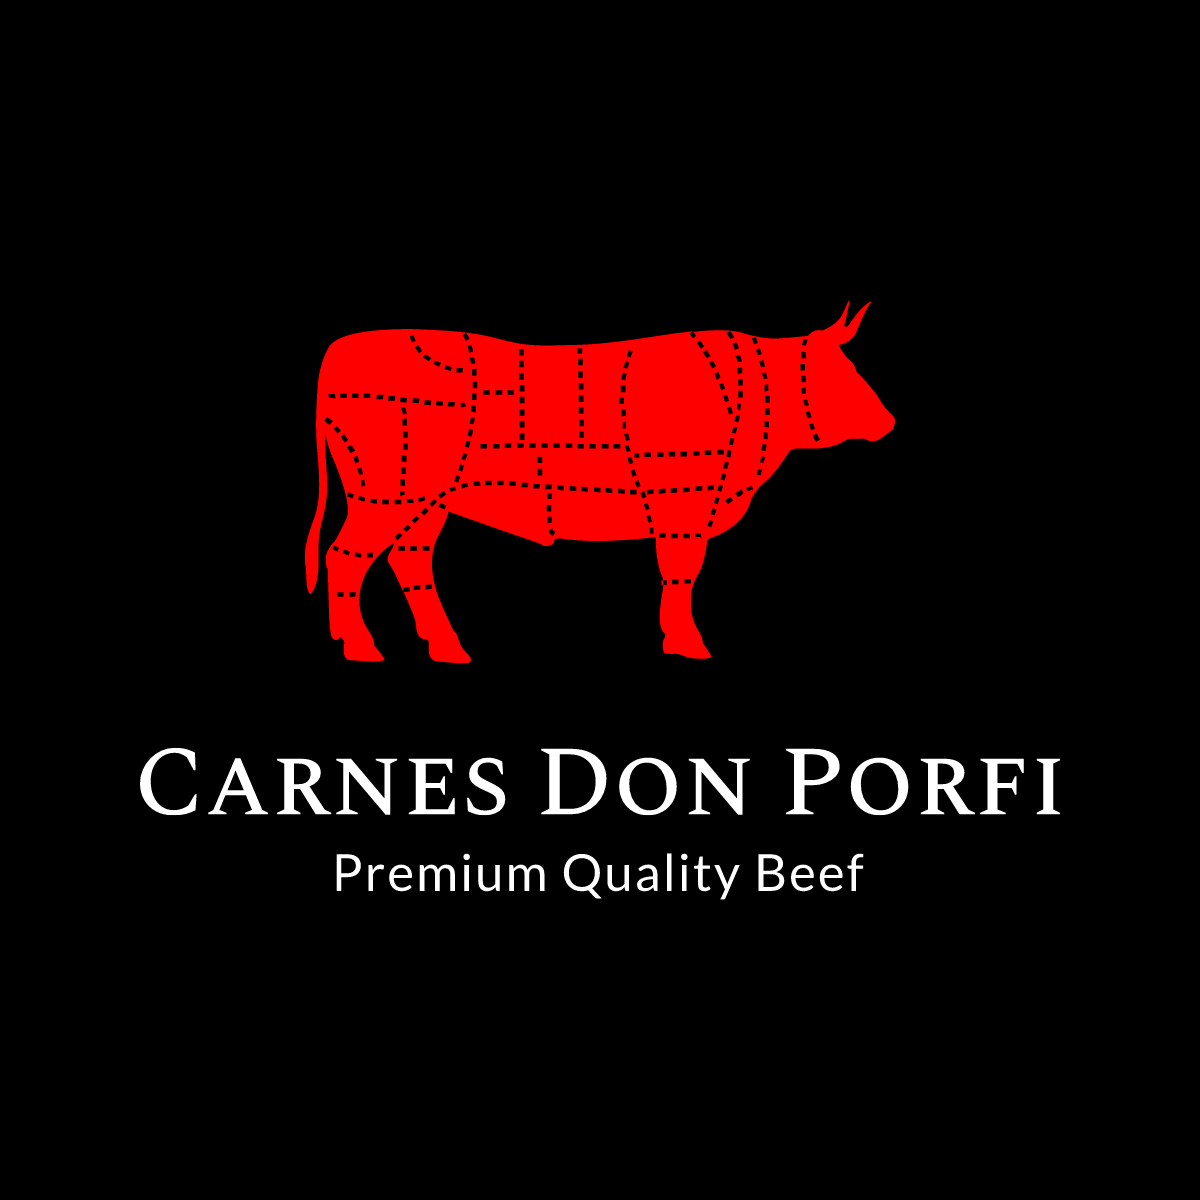 Carnes Don Porfi